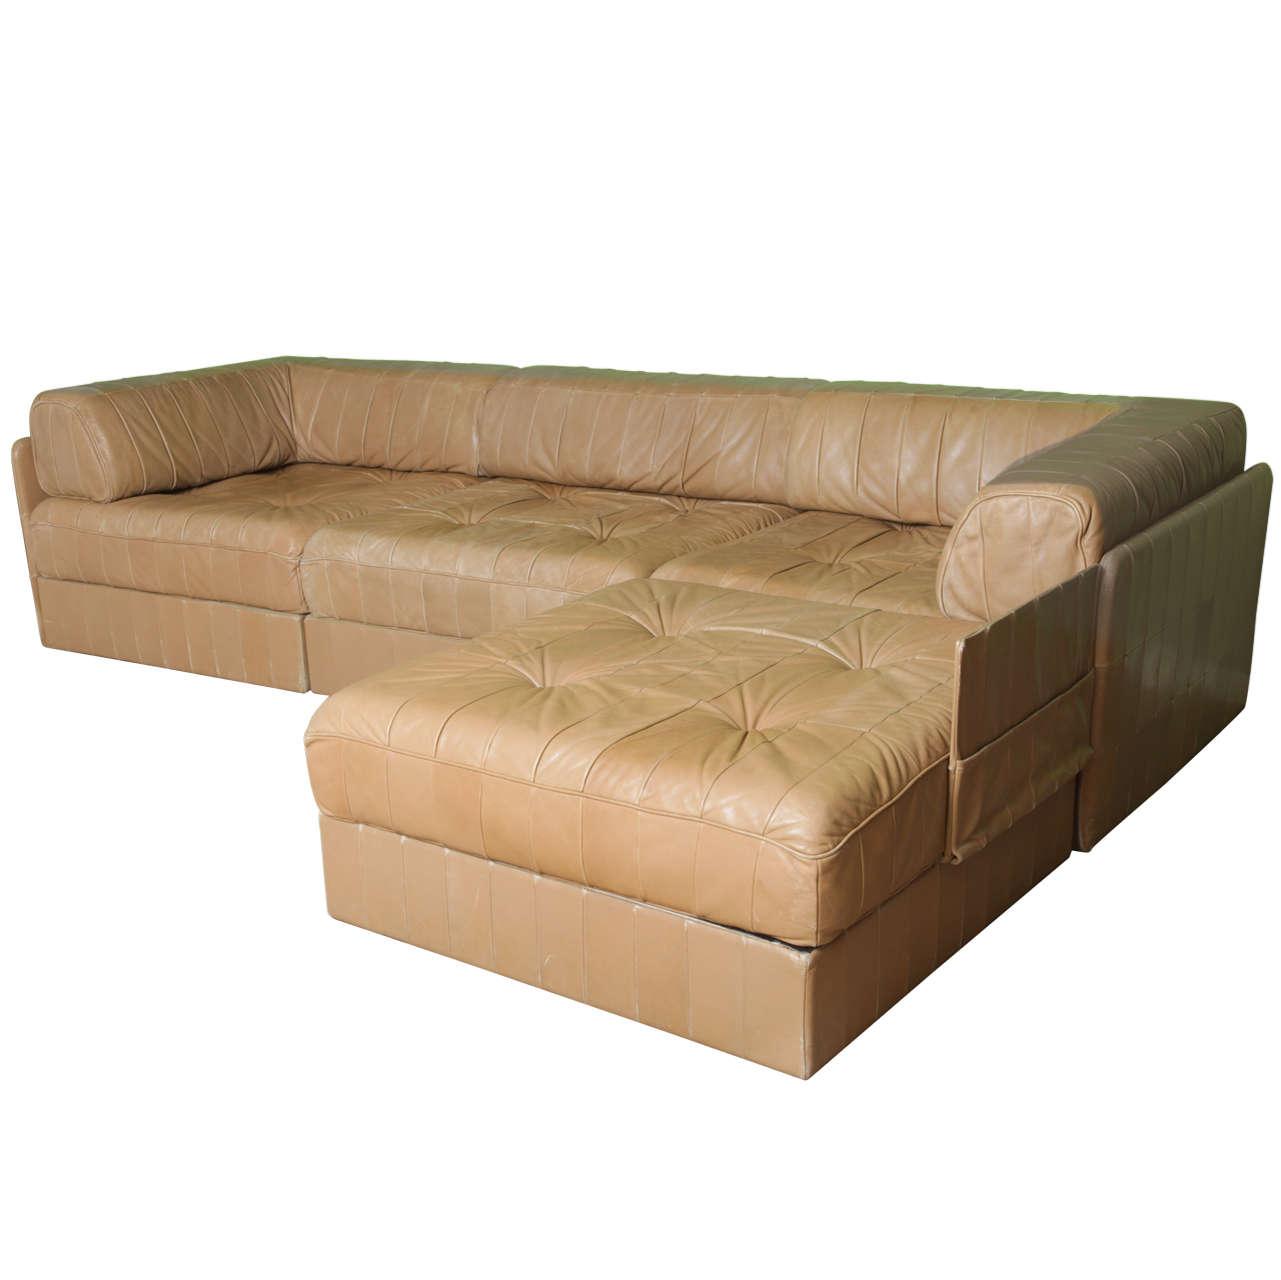 Leather Cognac De Sede Comfortable Living Room Set 39 70 39 S